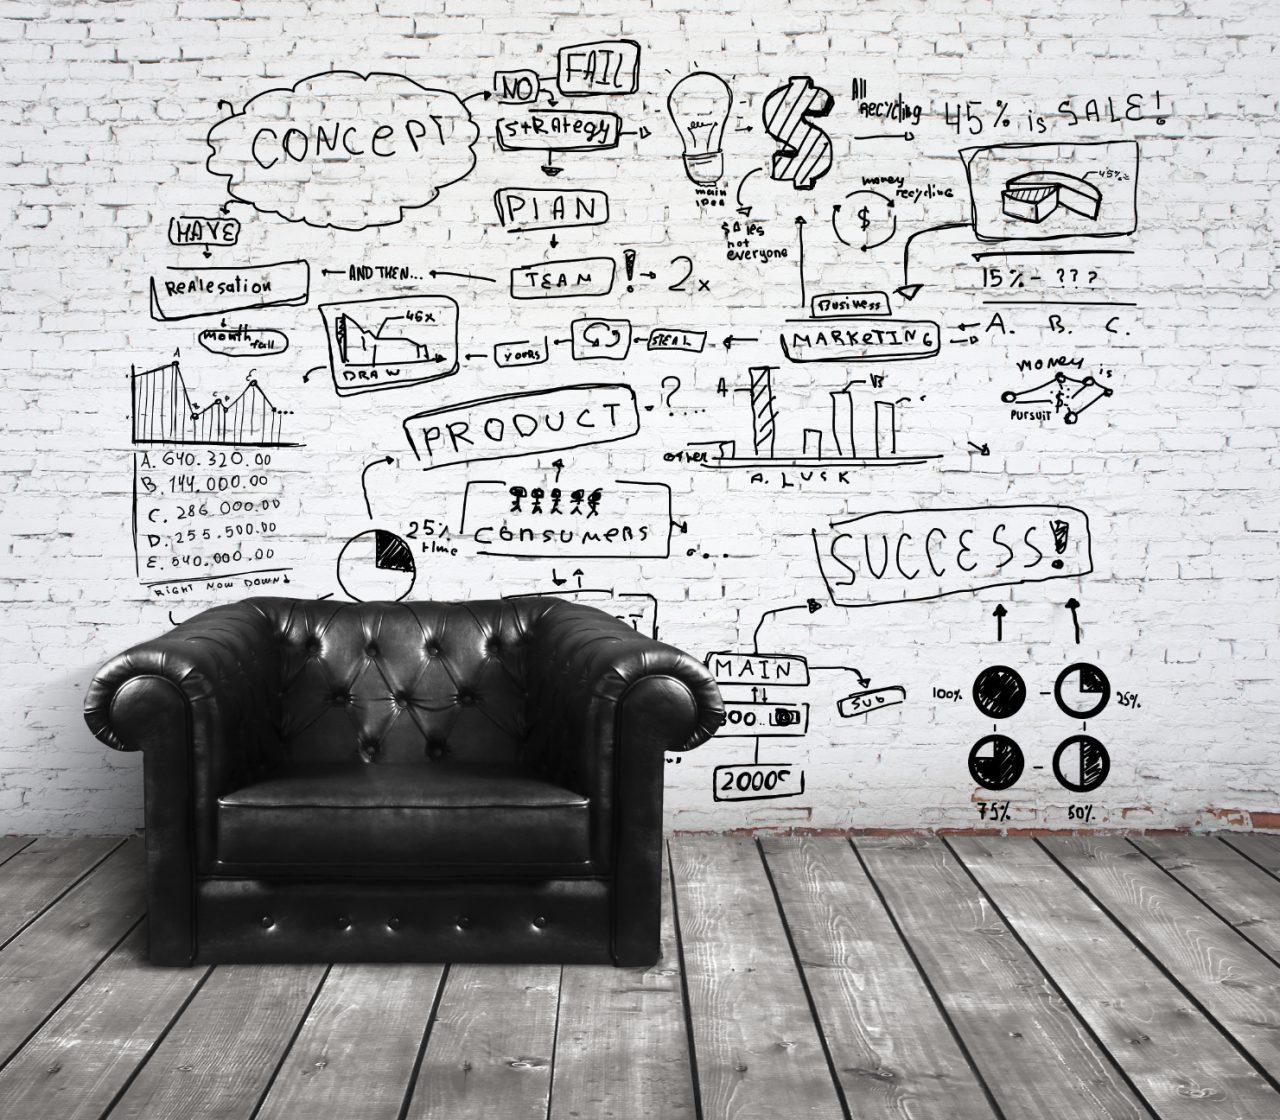 10 Ways to Build Success in 2015